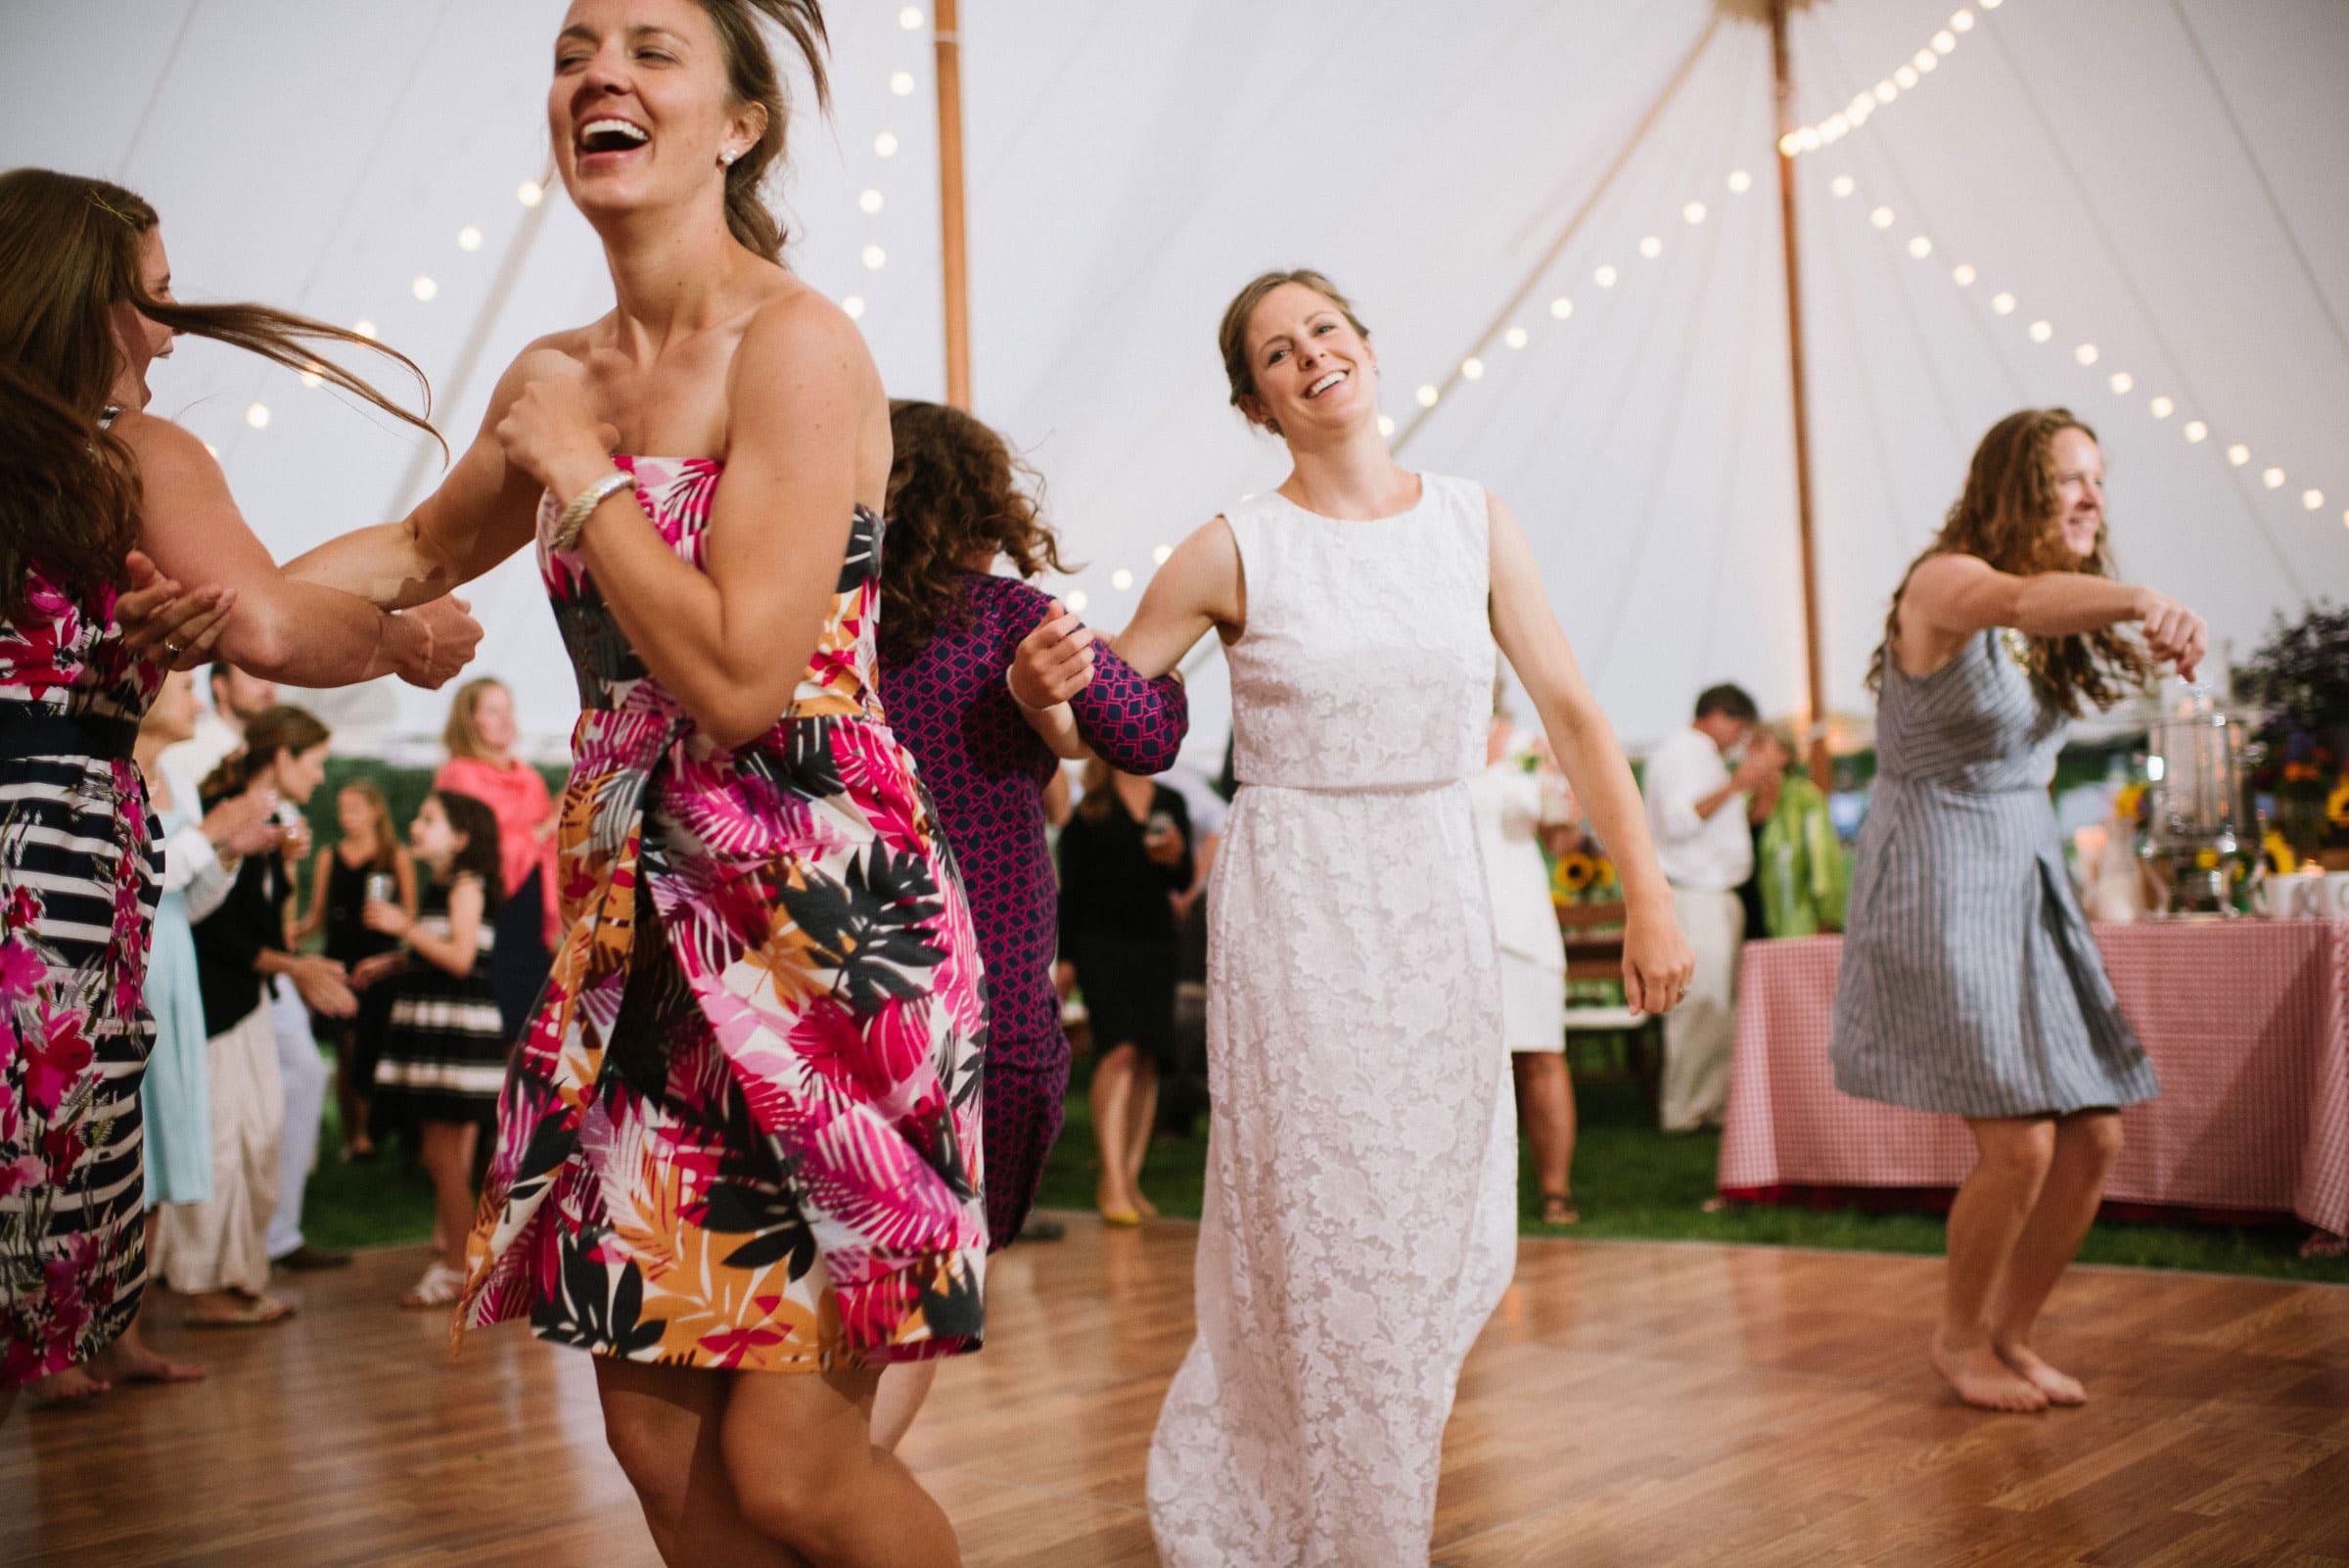 vermont backyard wedding duback photography